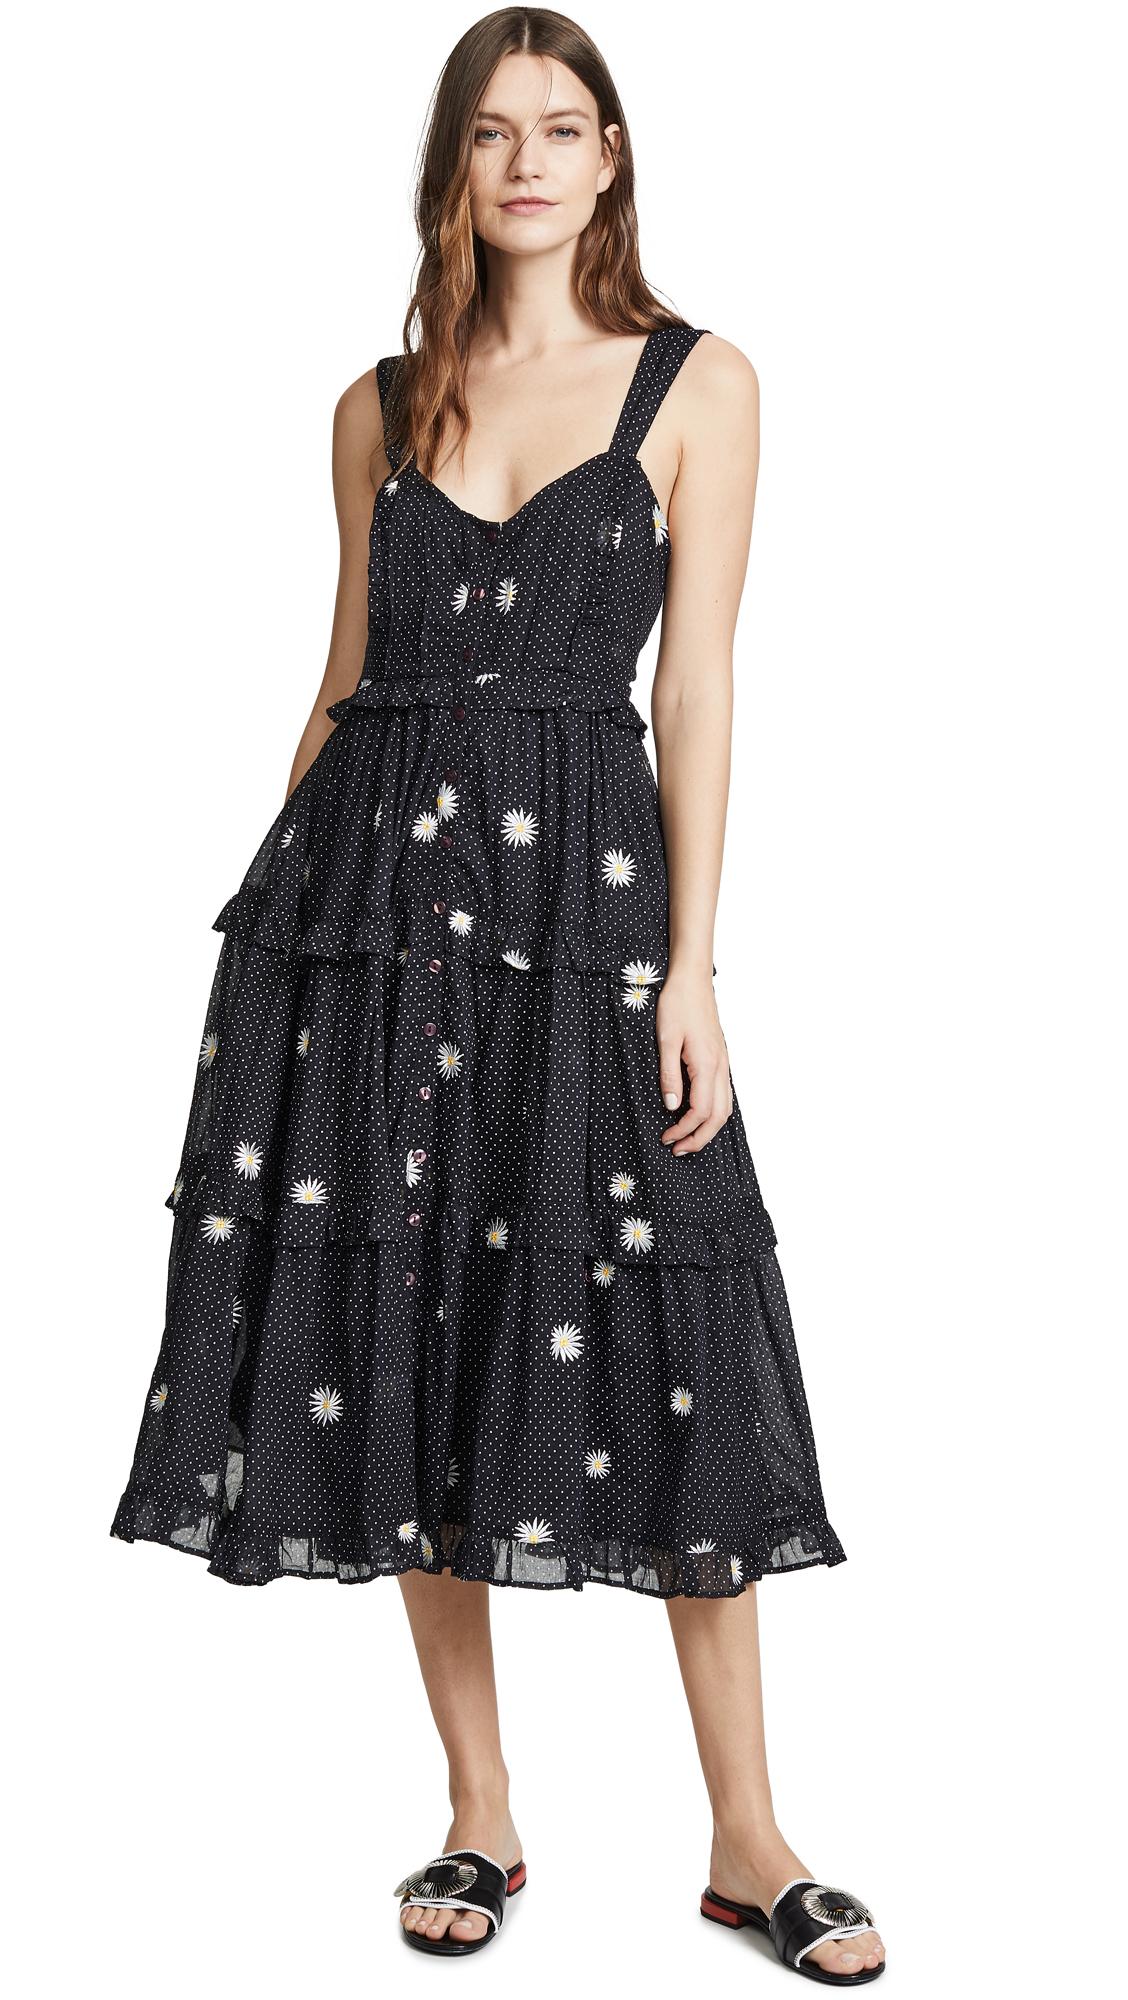 Free People Daisy Chain Midi Dress - Black Combo